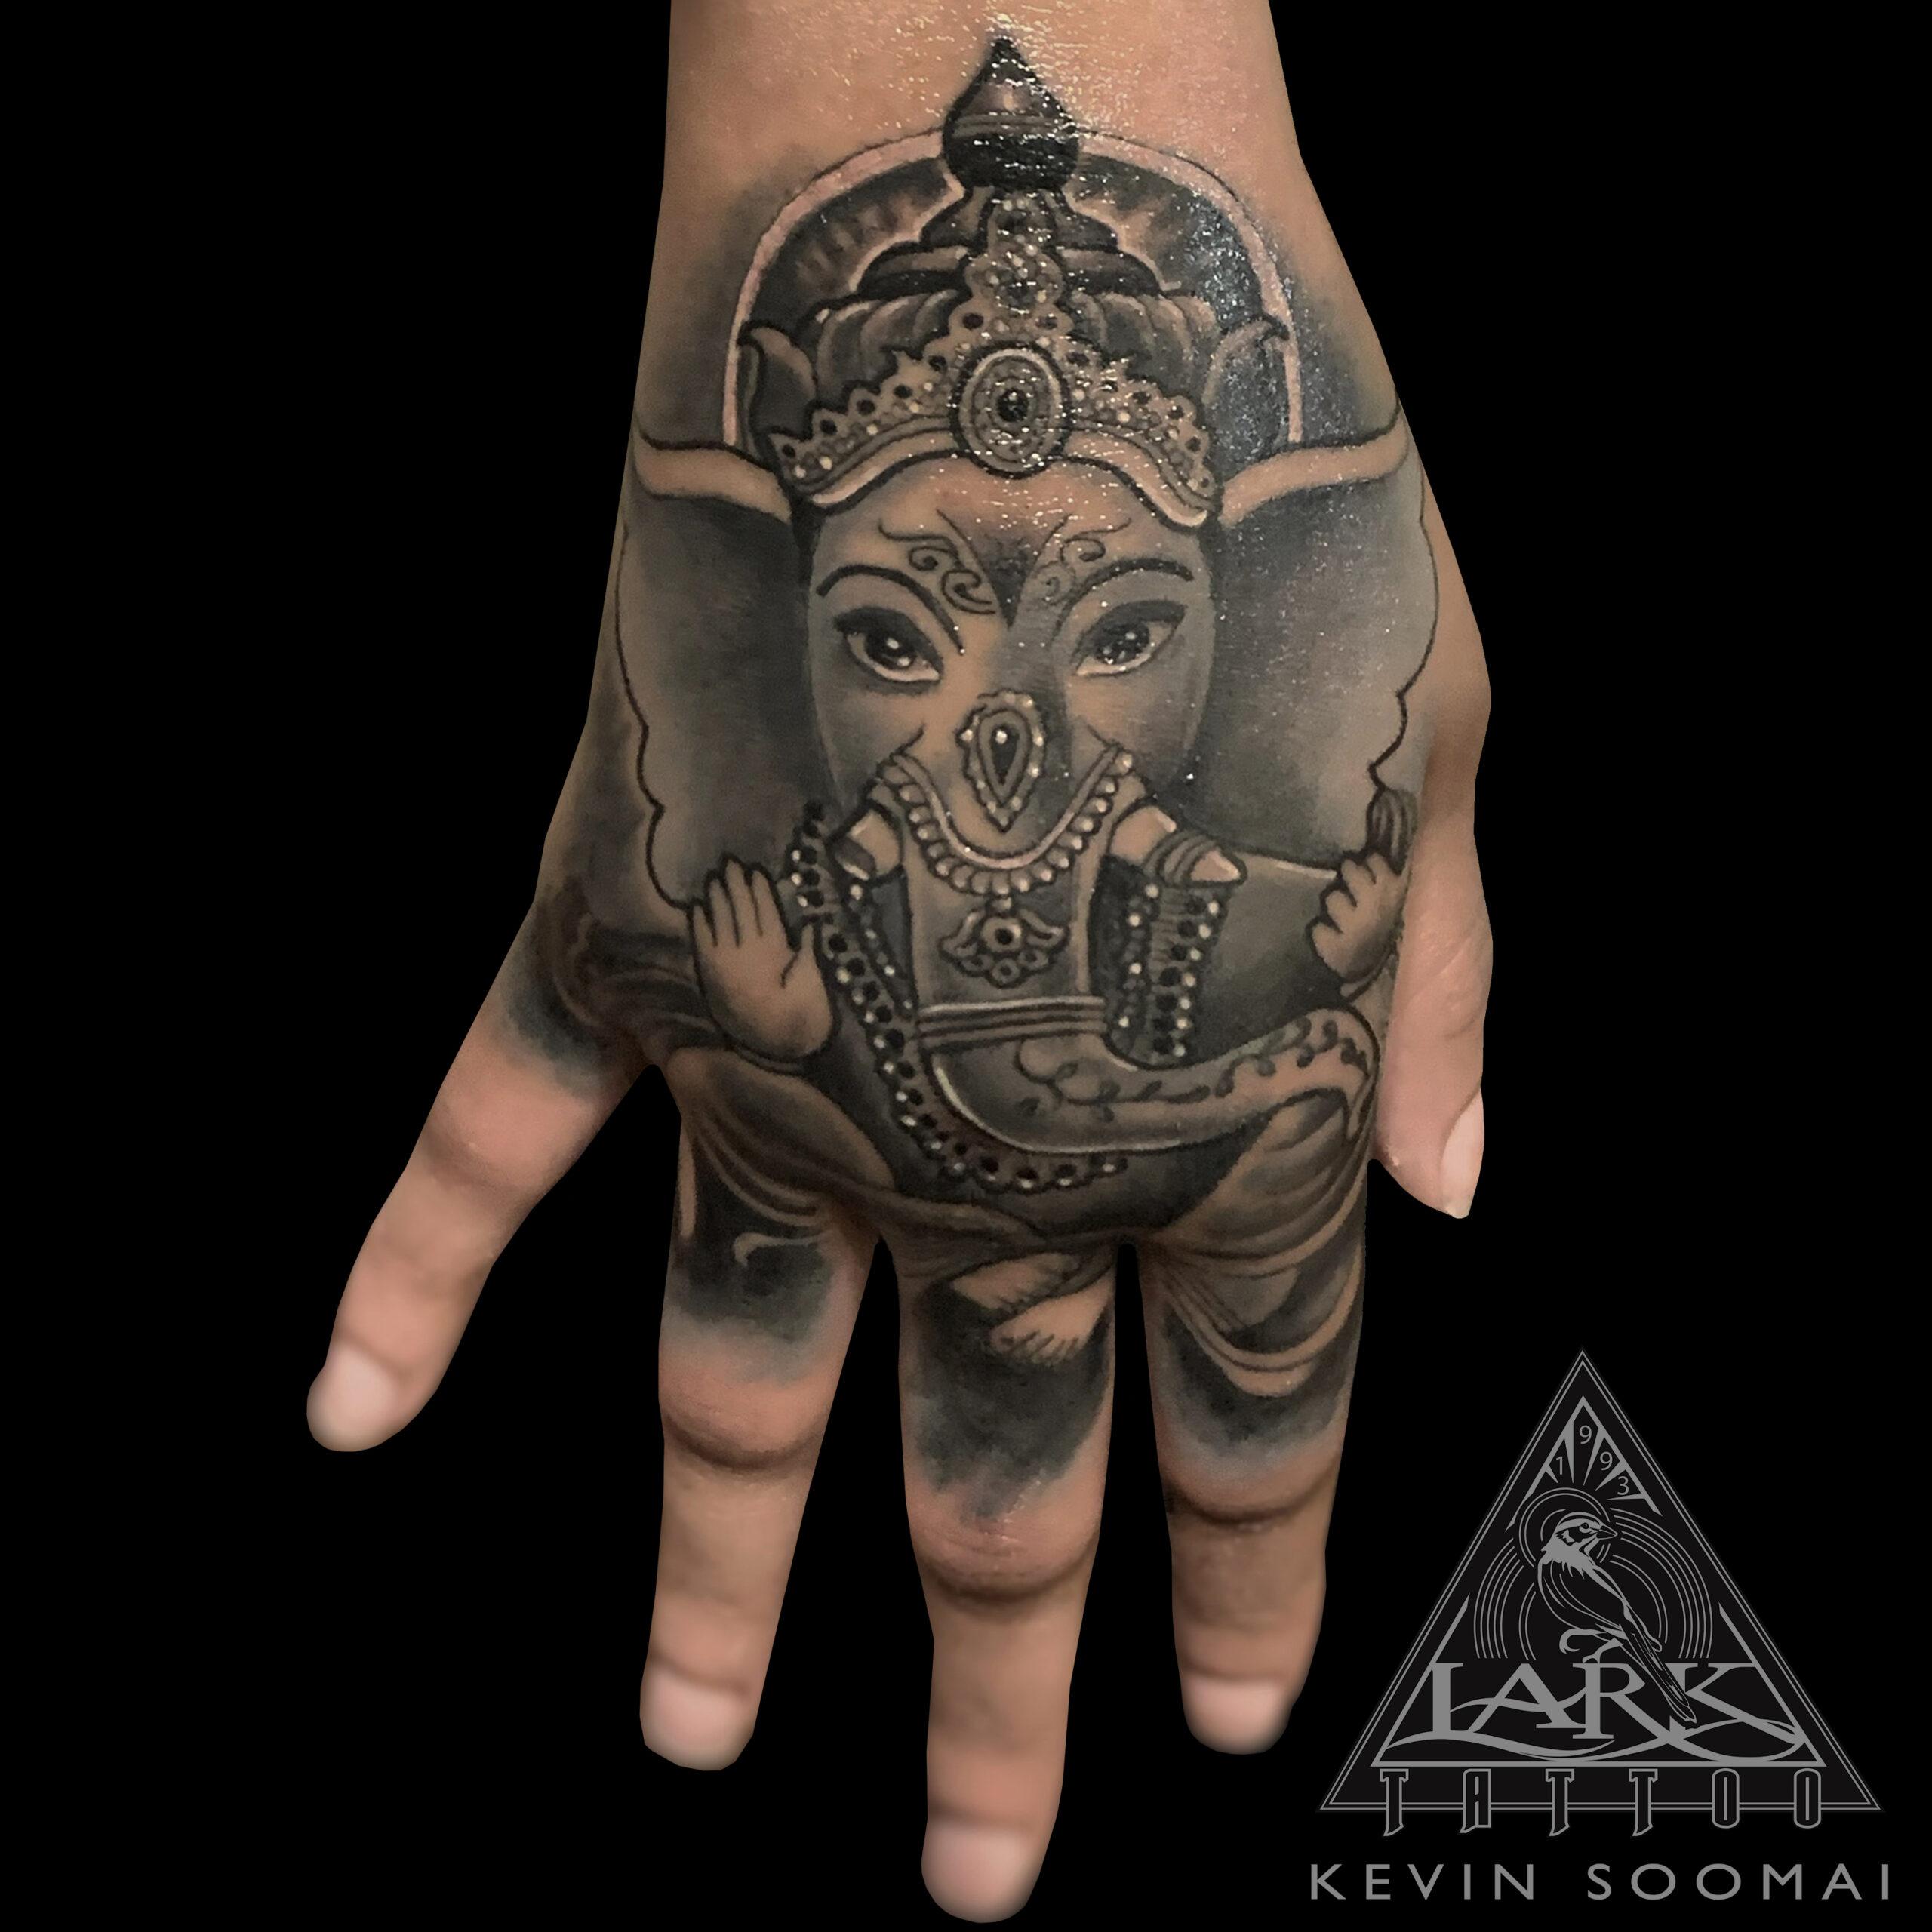 LarkTattoo, Tattoo, Ganesha, GaneshaTattoo, Ganesh, GaneshTattoo, Vinayaka, VinayakaTattoo, Ganapati, GanapatiTattoo, Hindu, HinduTattoo, Hand, HandTattoo, Diety, DietyTattoo, BNG, BNGTattoo, BNGInkSociety, BlackAndGray, BlackAndGrayTattoon, BlackAndGrey, BlackAndGreyTattoo, Tattoos , TattooArtist, Tattoist, Tattooer, LongIslandTattooArtist, LongIslandTattooer, LongIslandTattoo, TattooOfTheDay, Tat, Tats, Tatts, Tatted, Inked, Ink, TattooInk, AmazingInk, AmazingTattoo, BodyArt, LarkTattooWestbury, Westbury, LongIsland, NY, NewYork, USA, Art, Tattedup, InkedUp, LarkTattoos